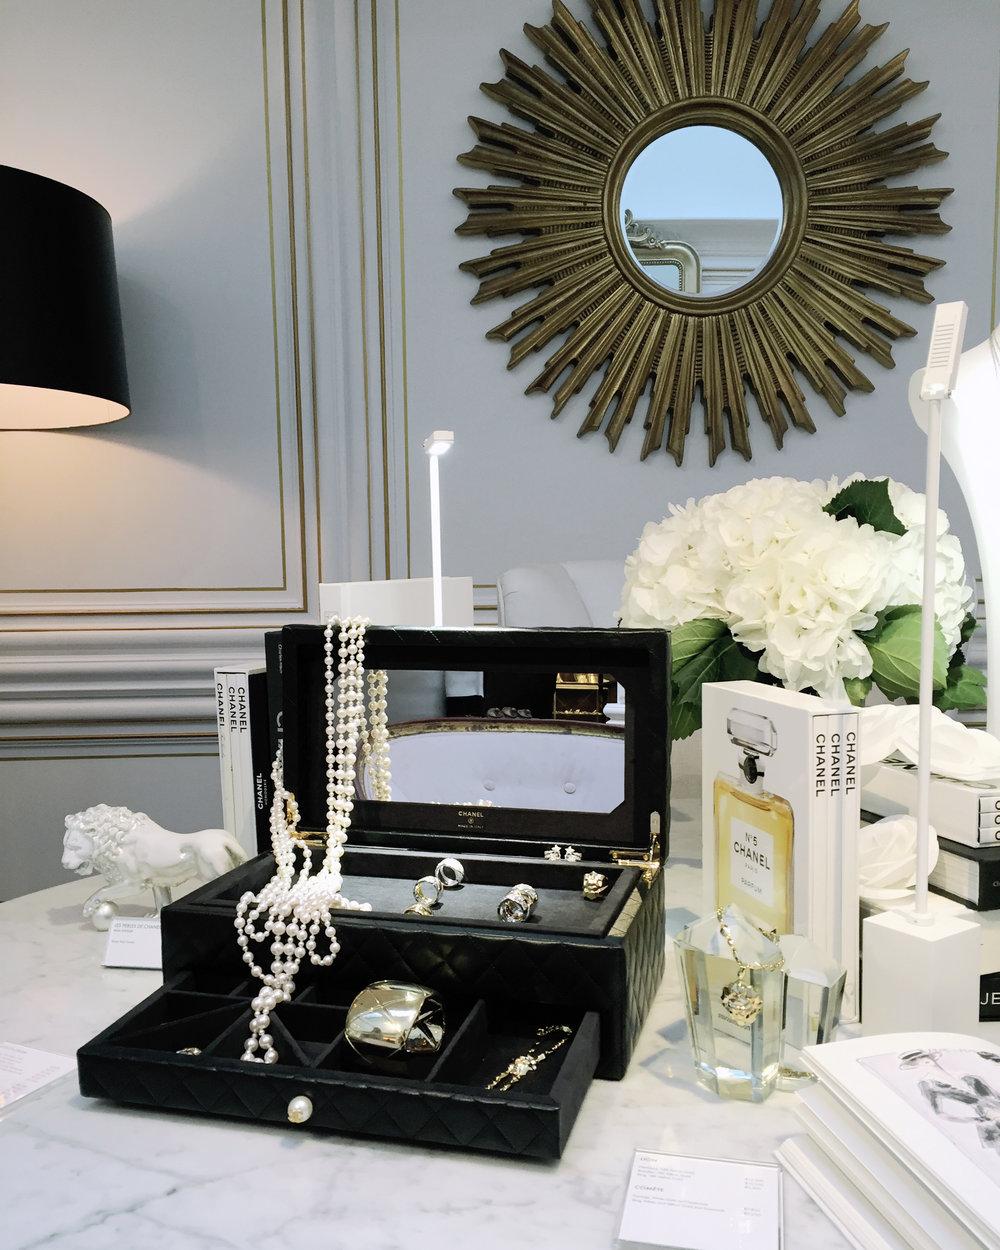 Chanel Jewel Box | Image by: Lauren L Caron © 2016